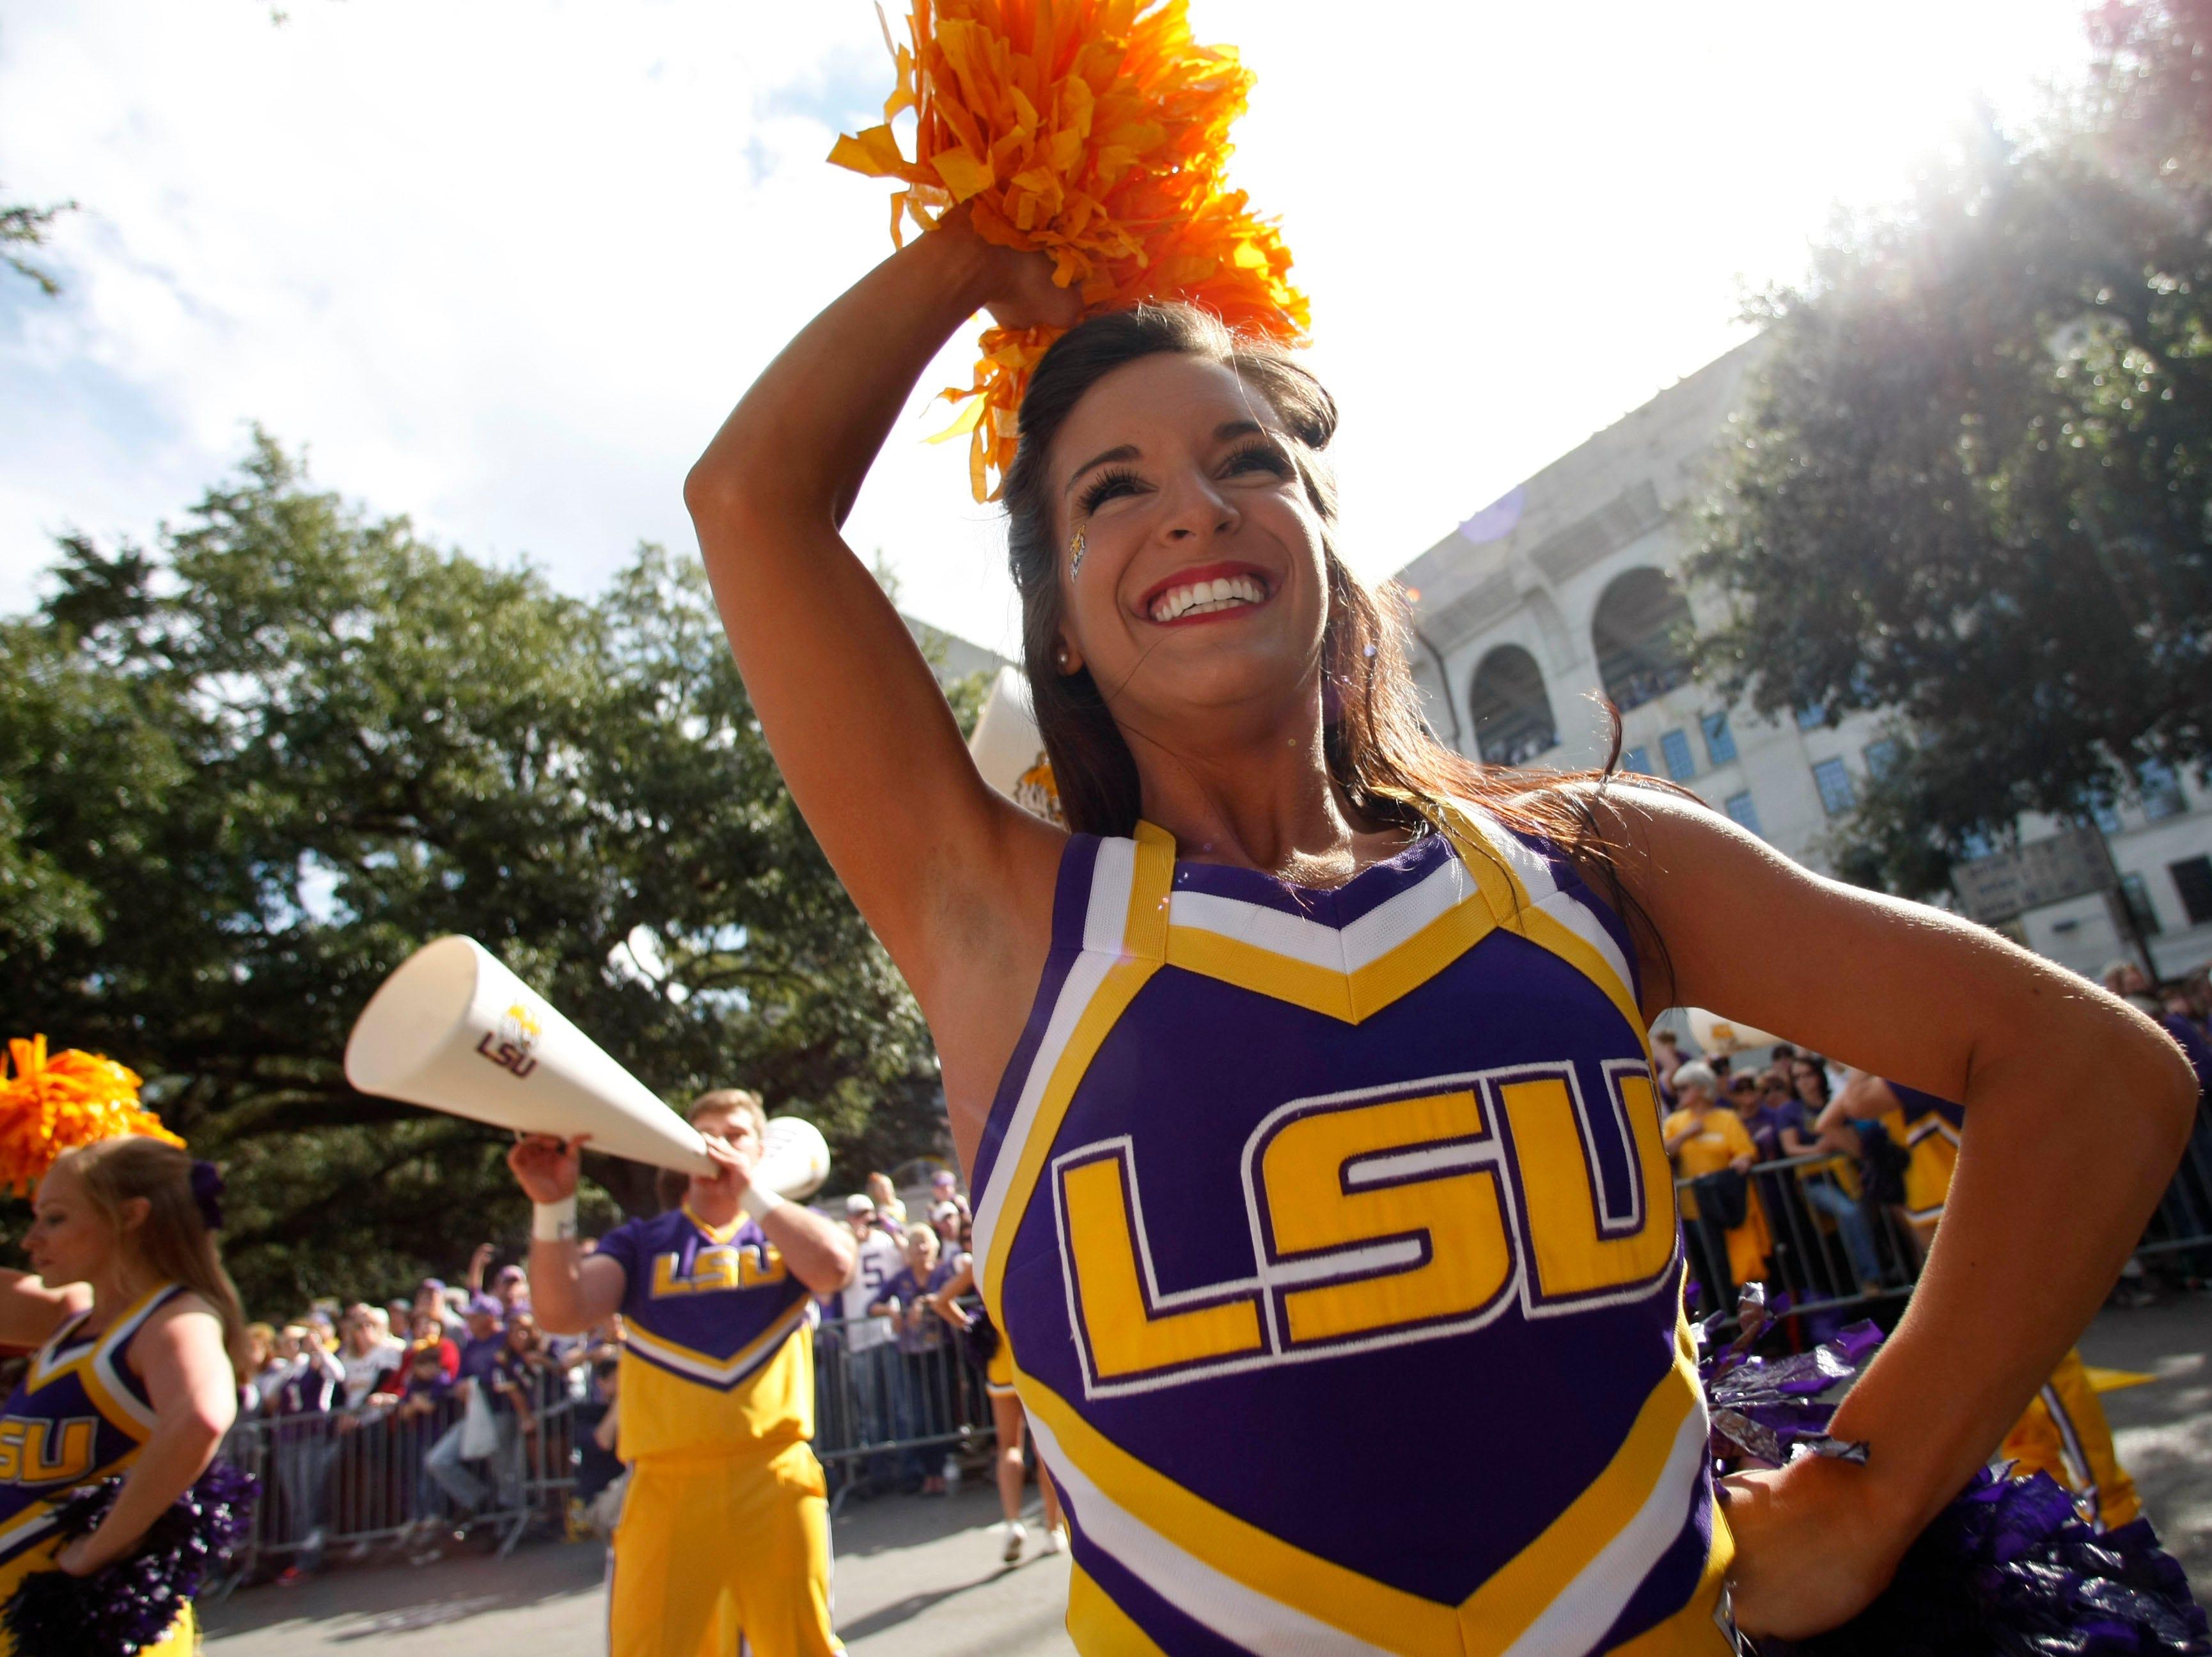 LSU cheerleaders pep up the crowd outside Tiger Stadium before their NCAA college football game against Arkansas in Baton Rouge, La., Friday, Nov. 25, 2011. (AP Photo/Gerald Herbert)